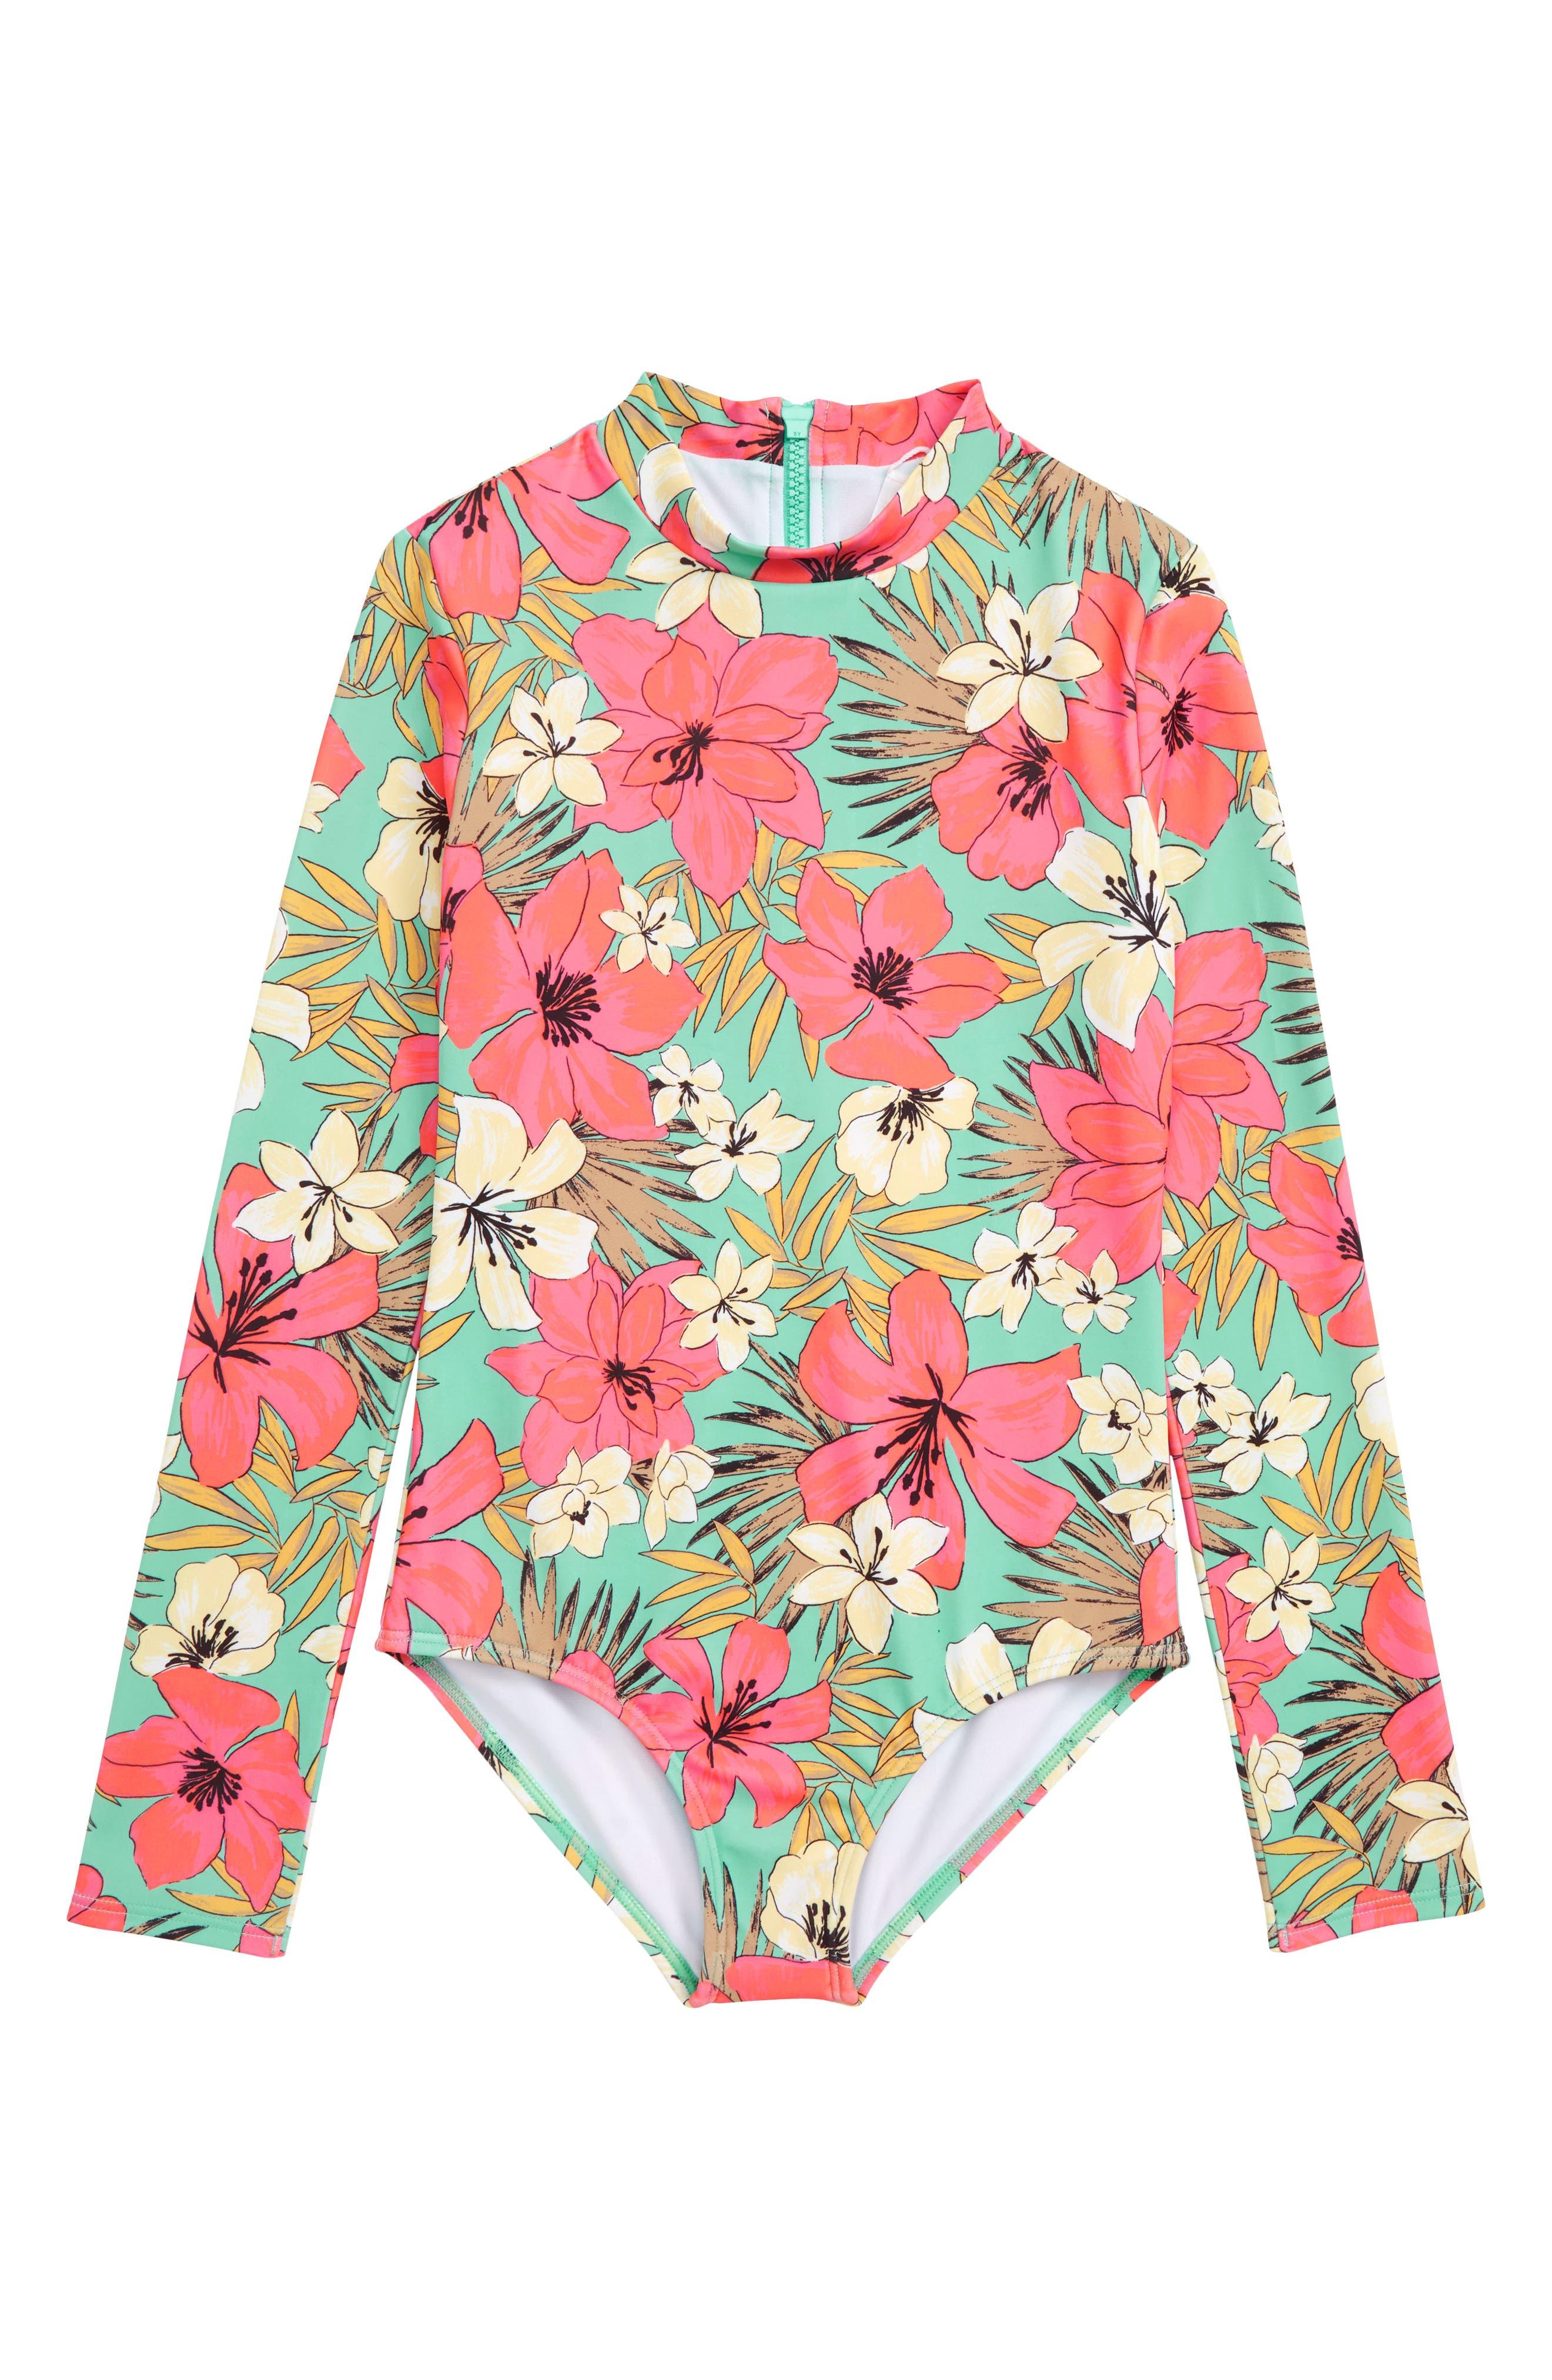 Aloha Sun One-Piece Rashguard Swimsuit, Main, color, MO-MINT